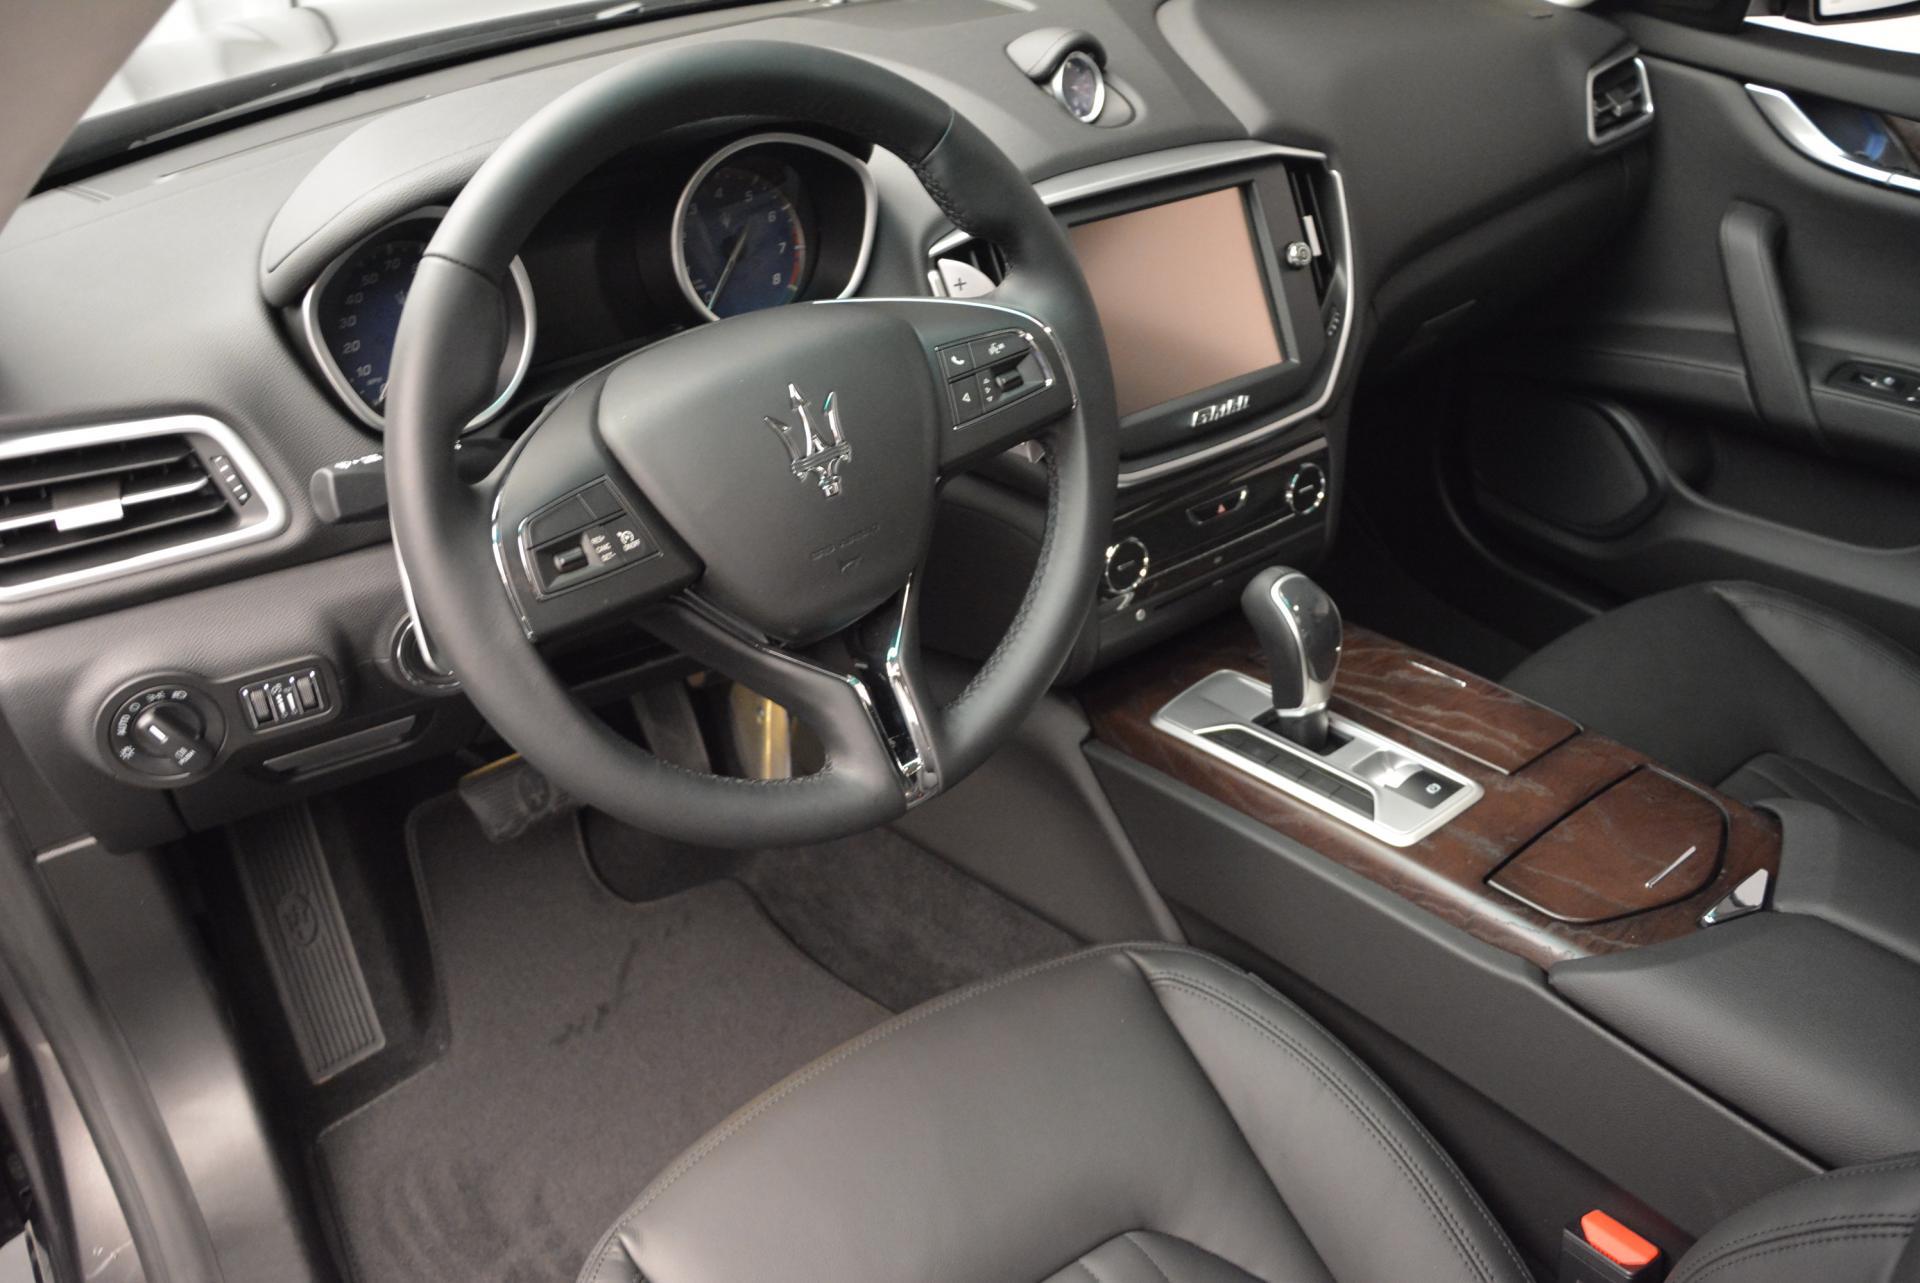 Used 2015 Maserati Ghibli S Q4 For Sale In Greenwich, CT 119_p12